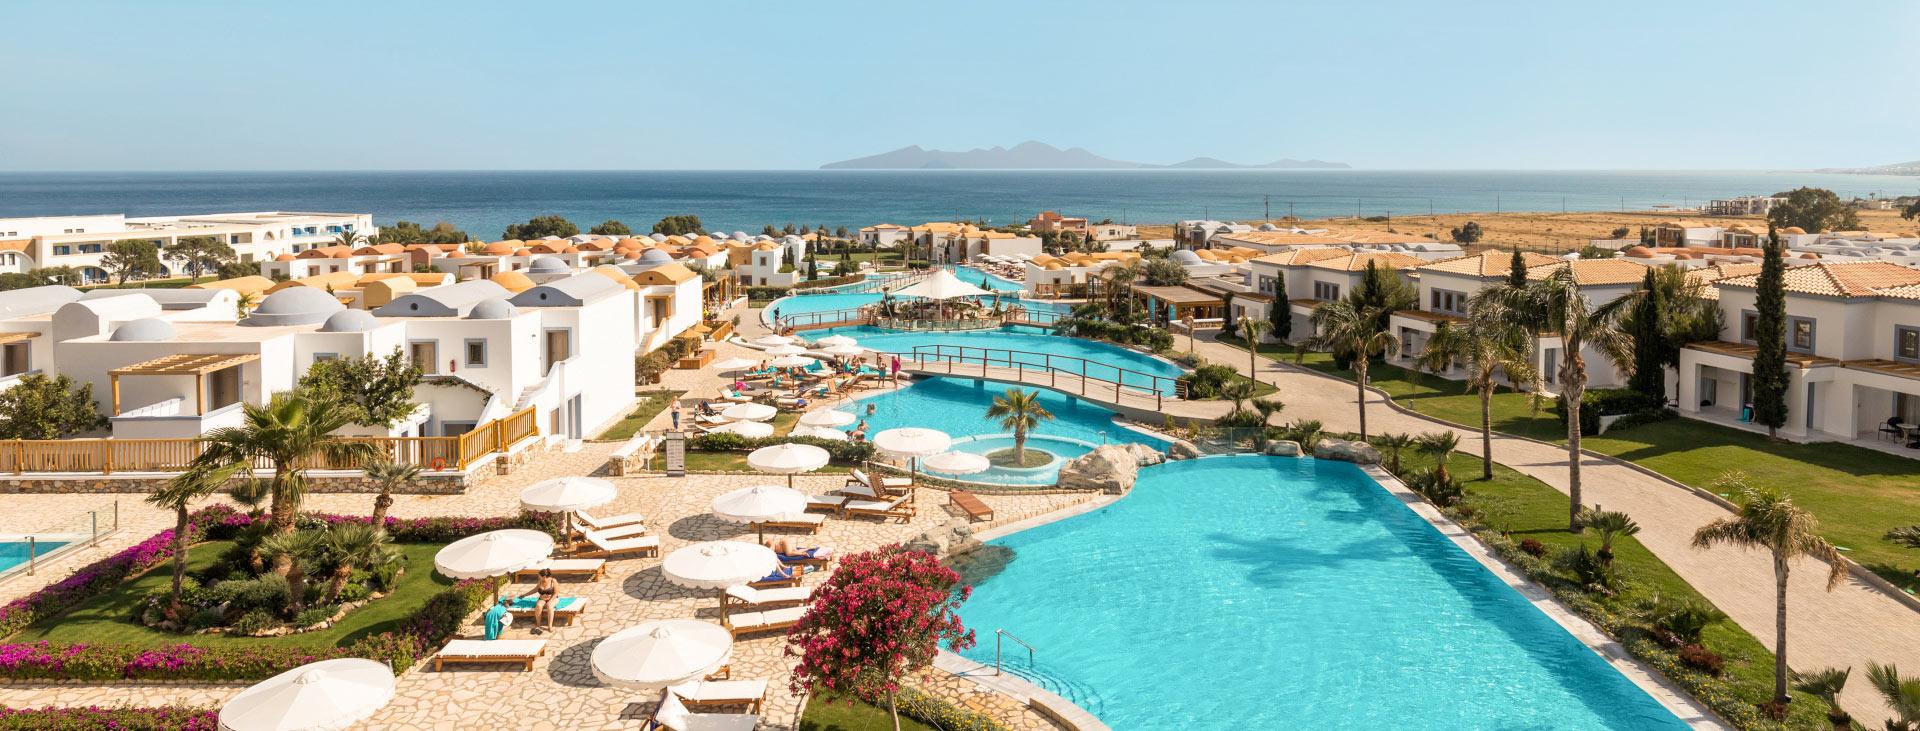 Mitsis Blue Domes Resort & Spa, Kardamena, Kos, Grekland